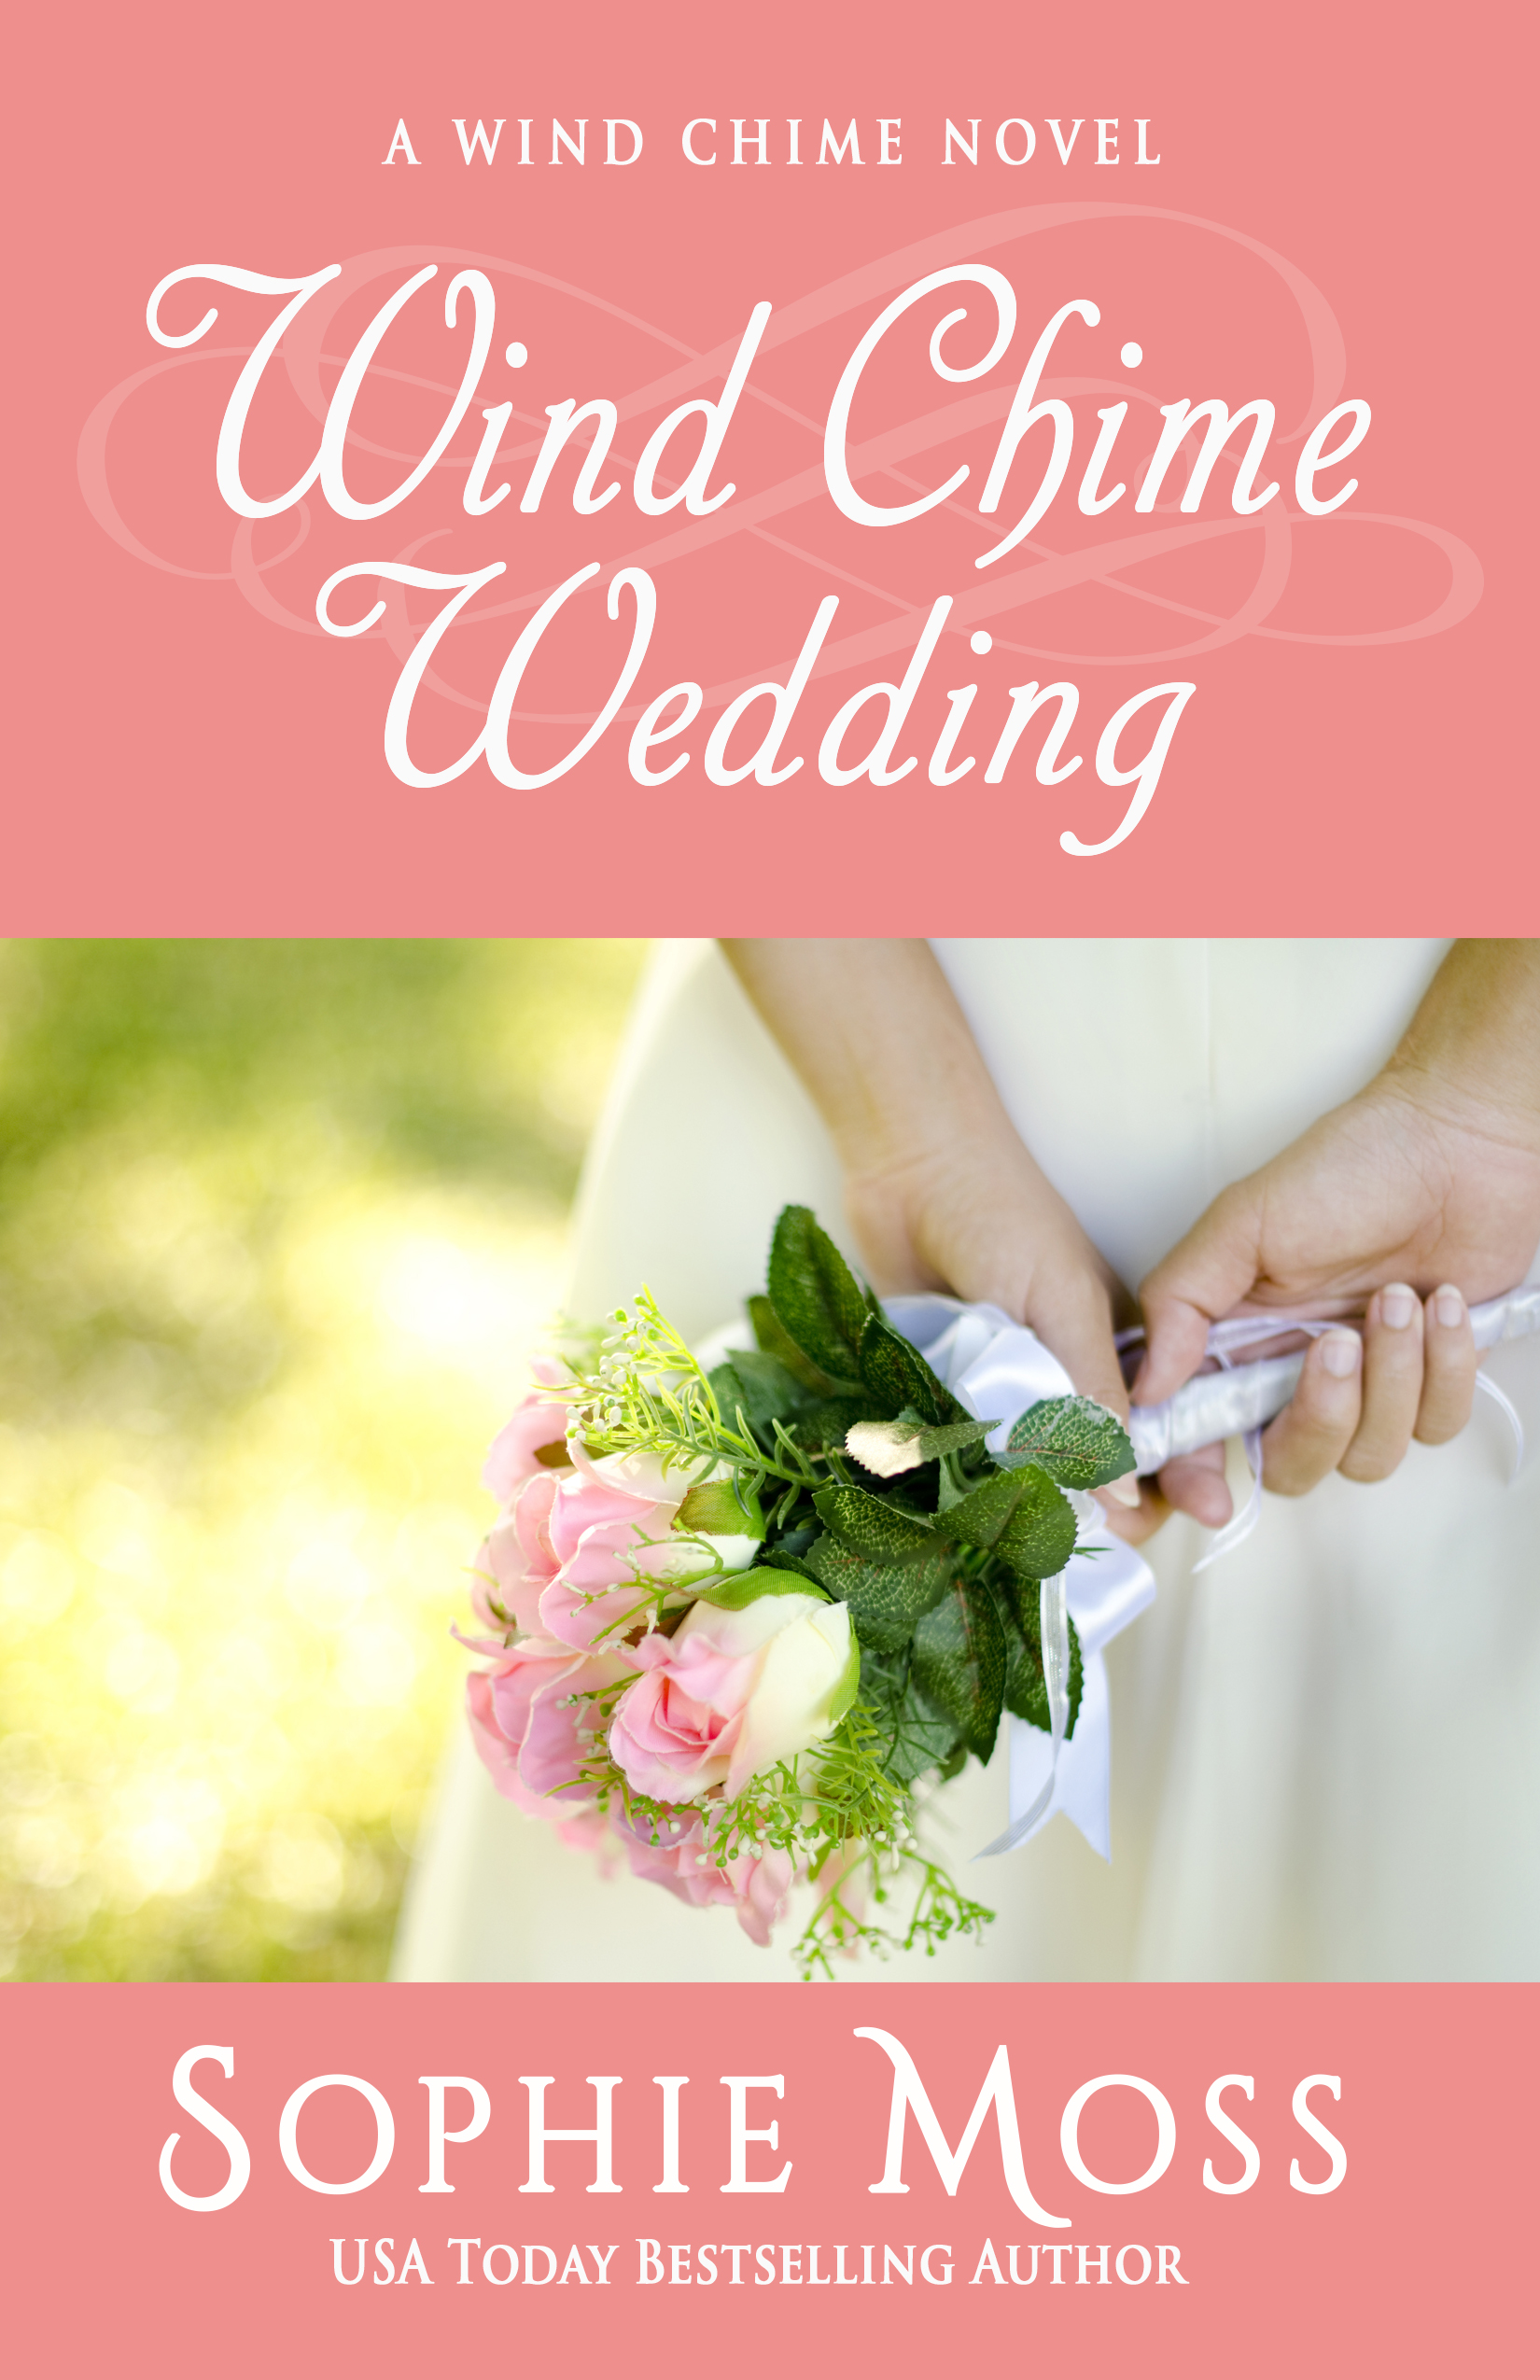 Wind Chime Wedding ebook cover Aug 14 2017 VELLUM.jpg